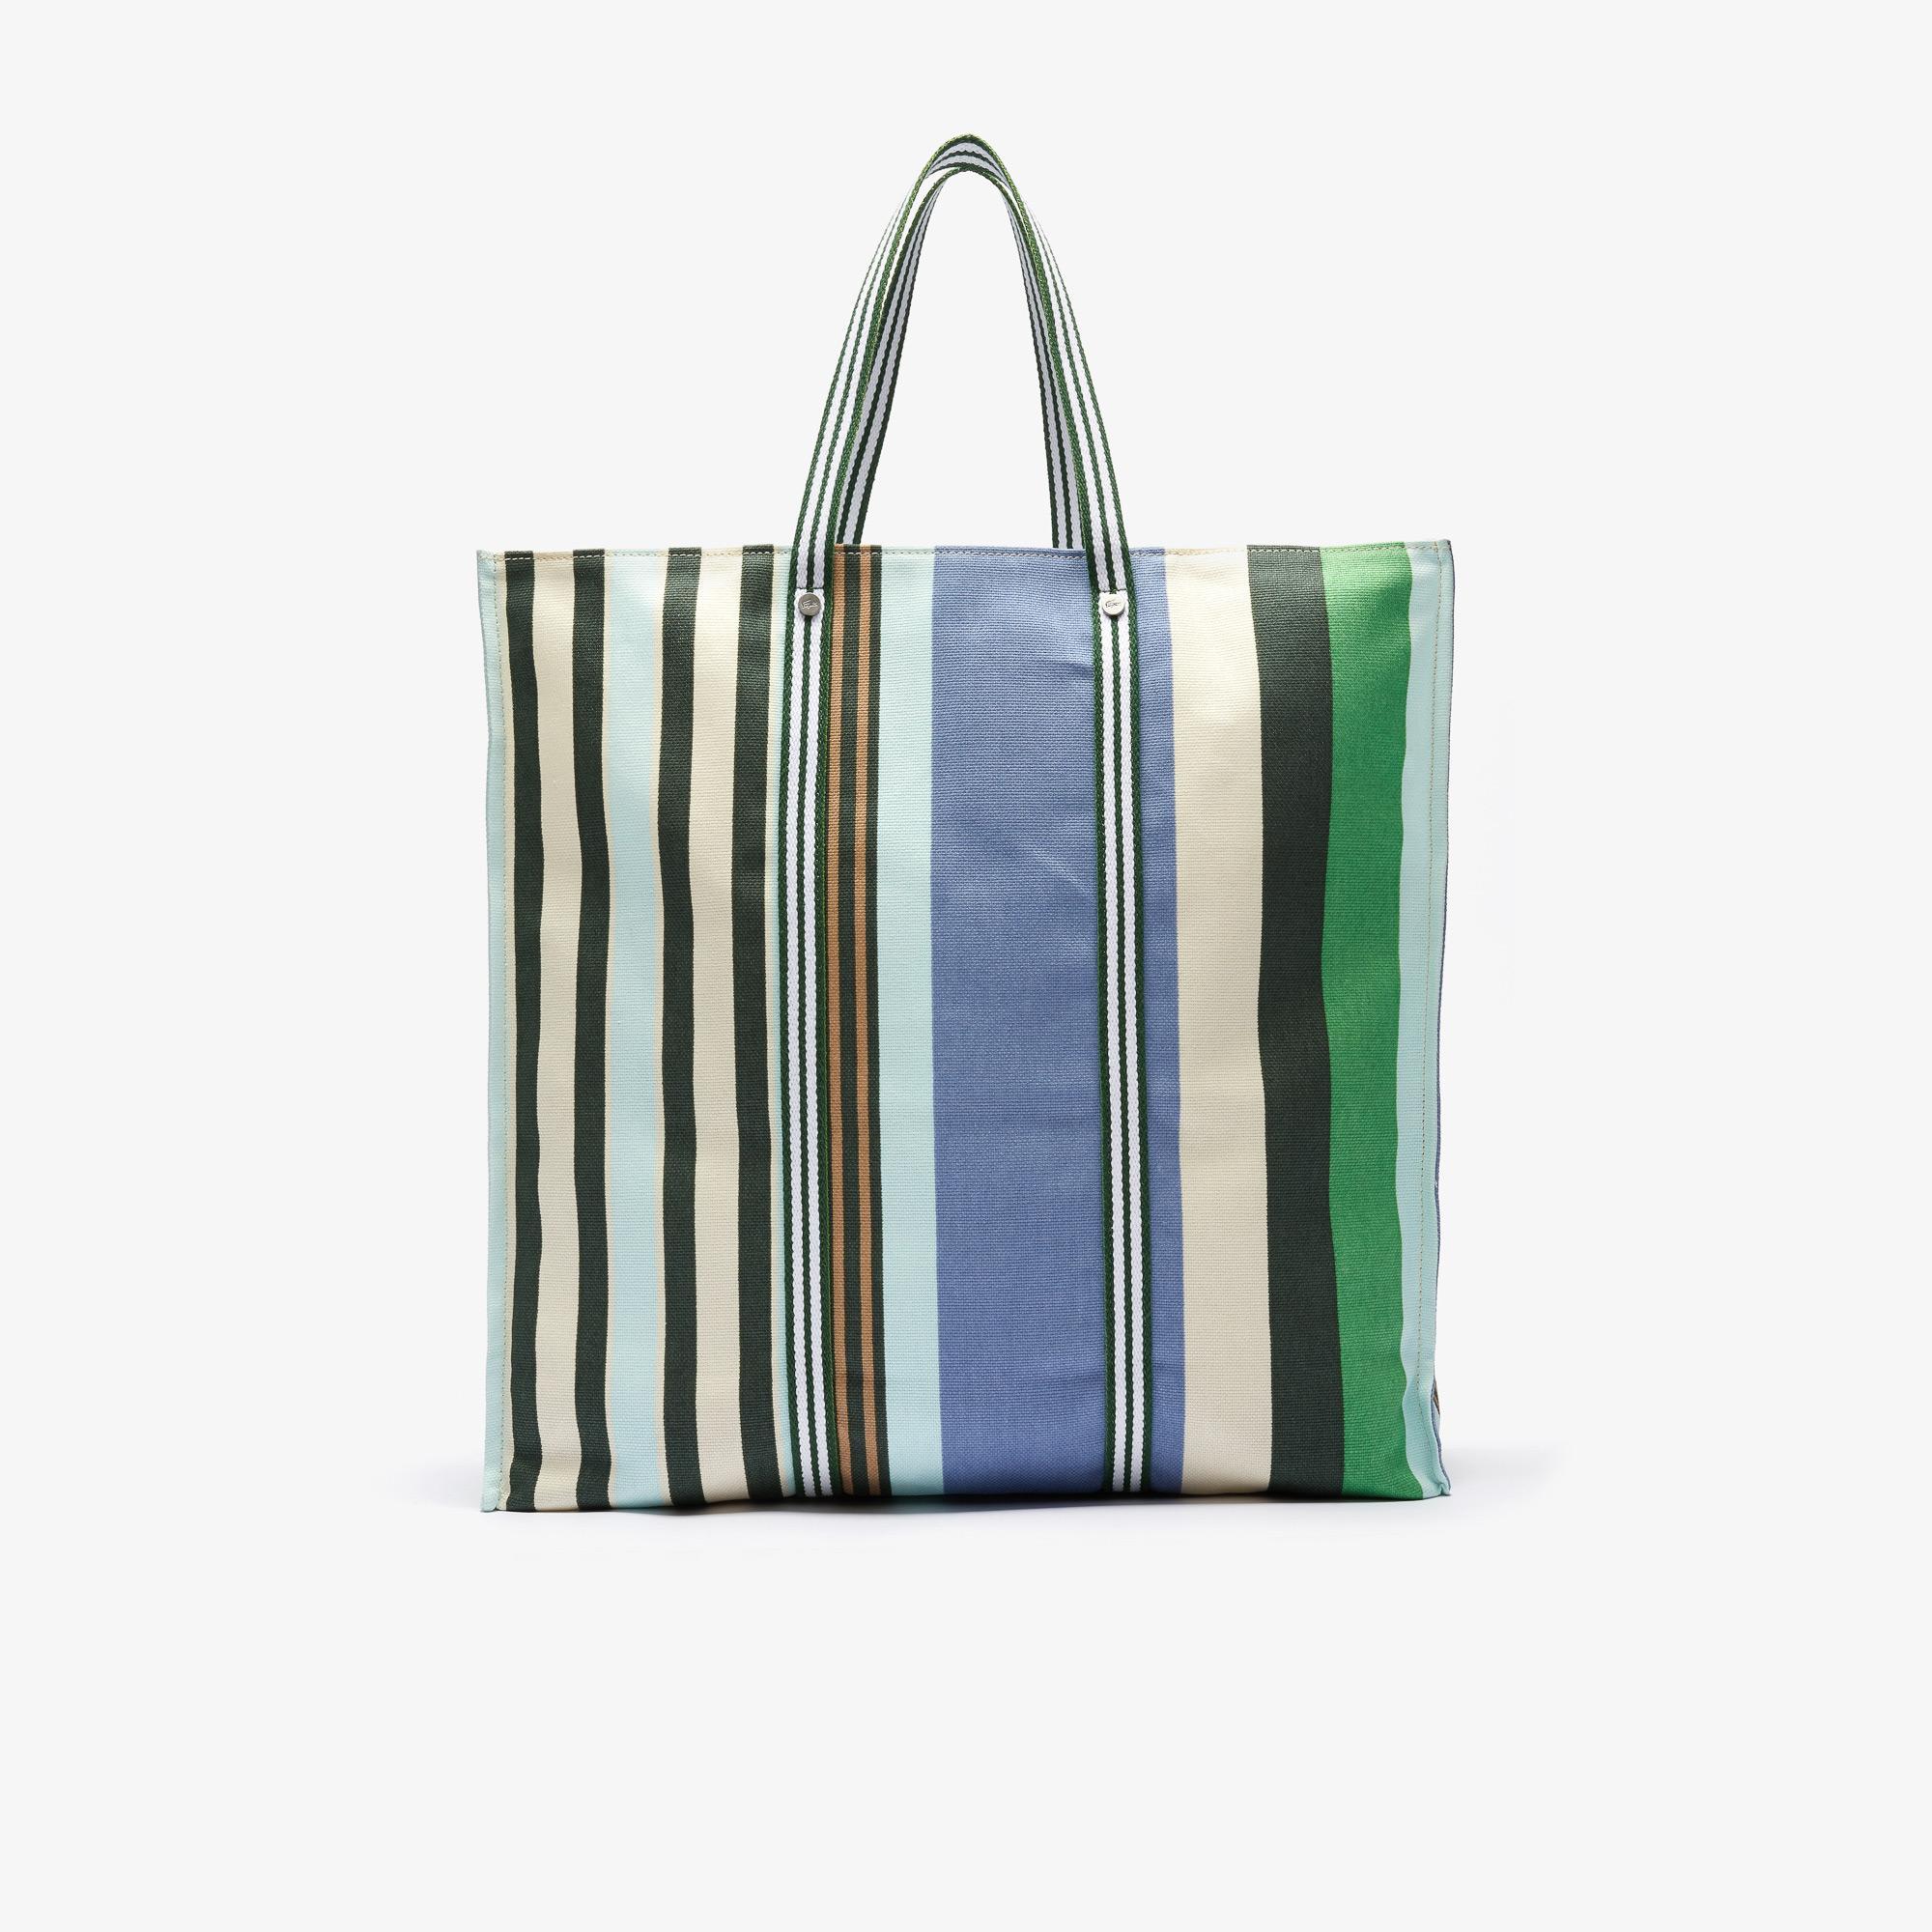 Lacoste Women's Striped Cotton Canvas Tote Bag